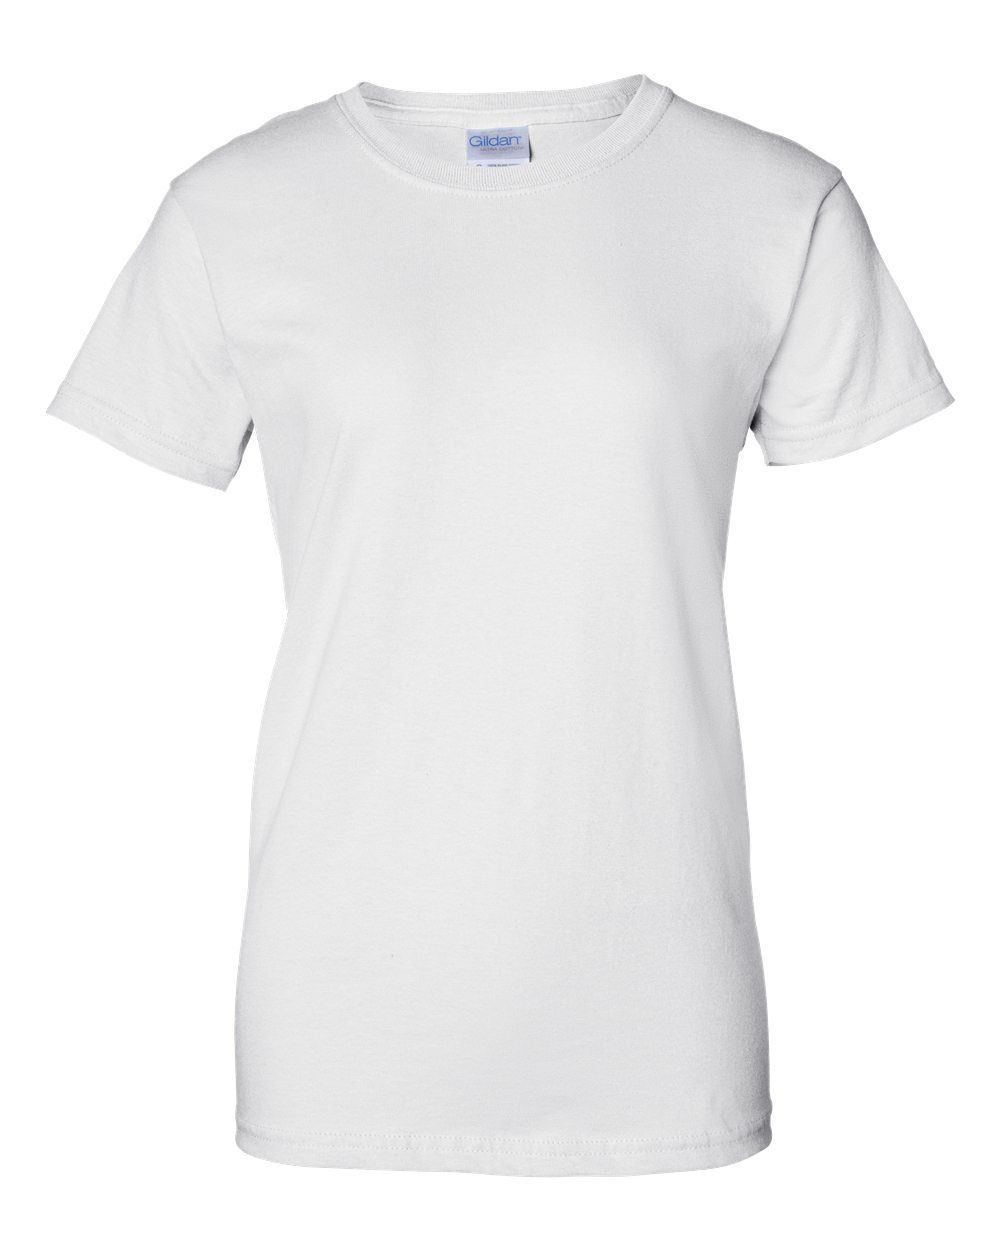 Gildan Cotton 6 oz. T-Shirt (G200L)